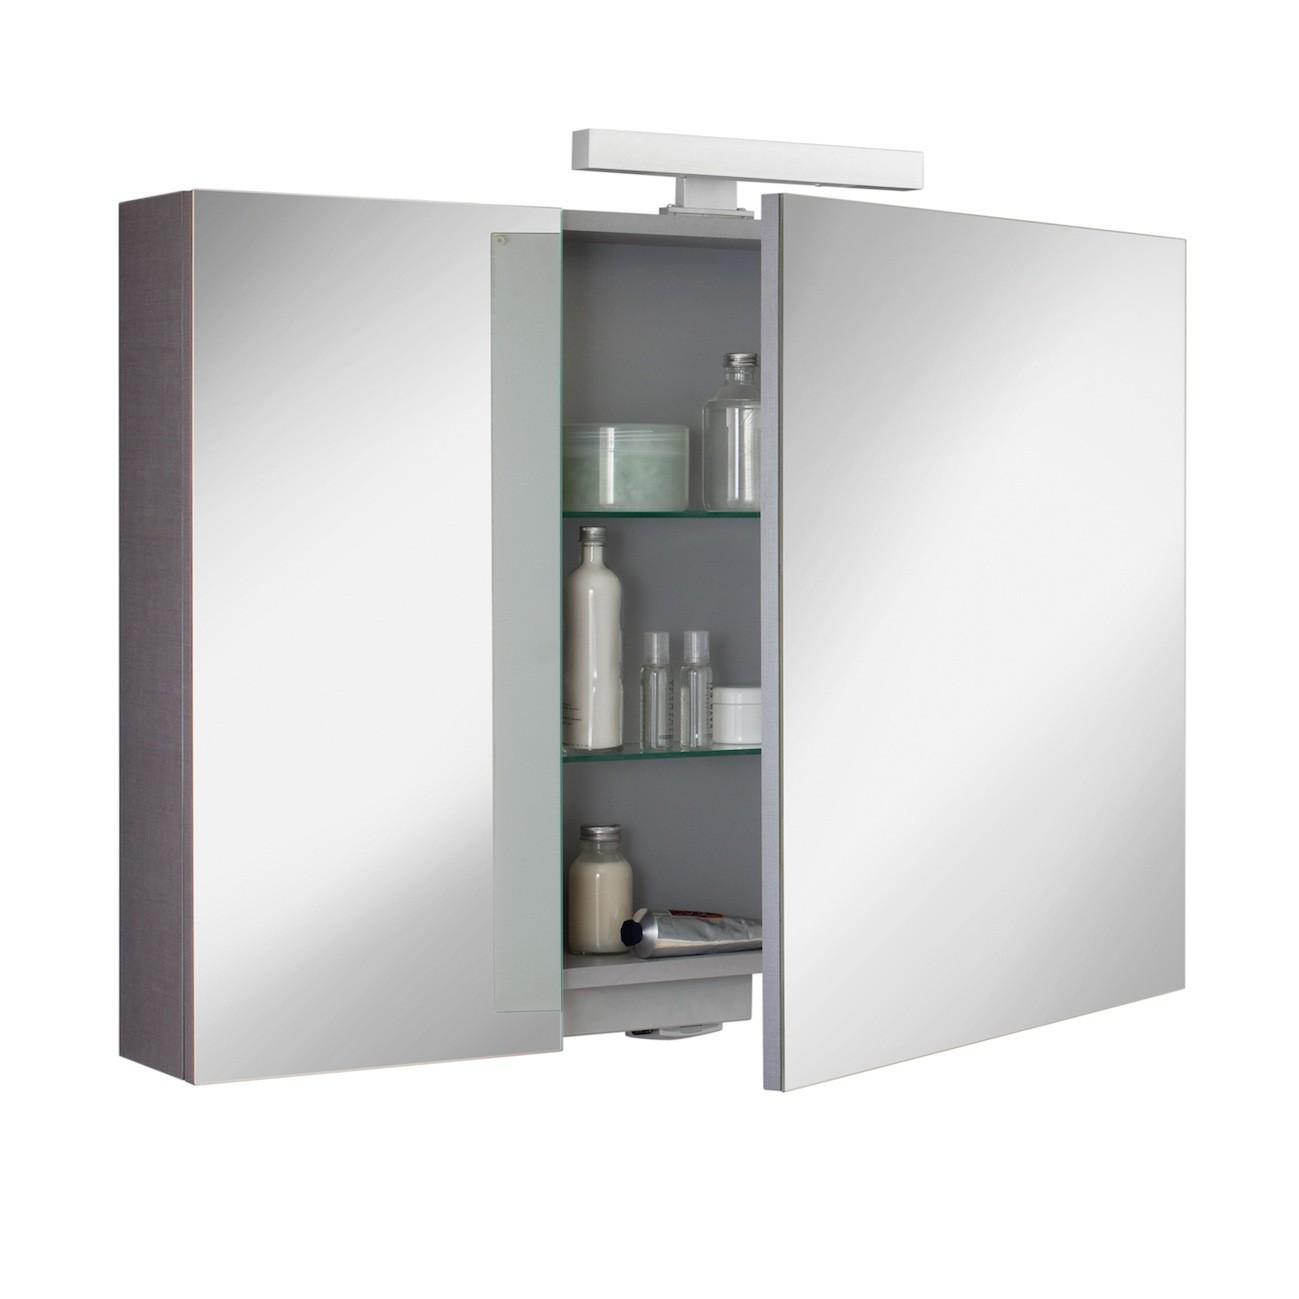 armoires de toilette sanijura flybox. Black Bedroom Furniture Sets. Home Design Ideas